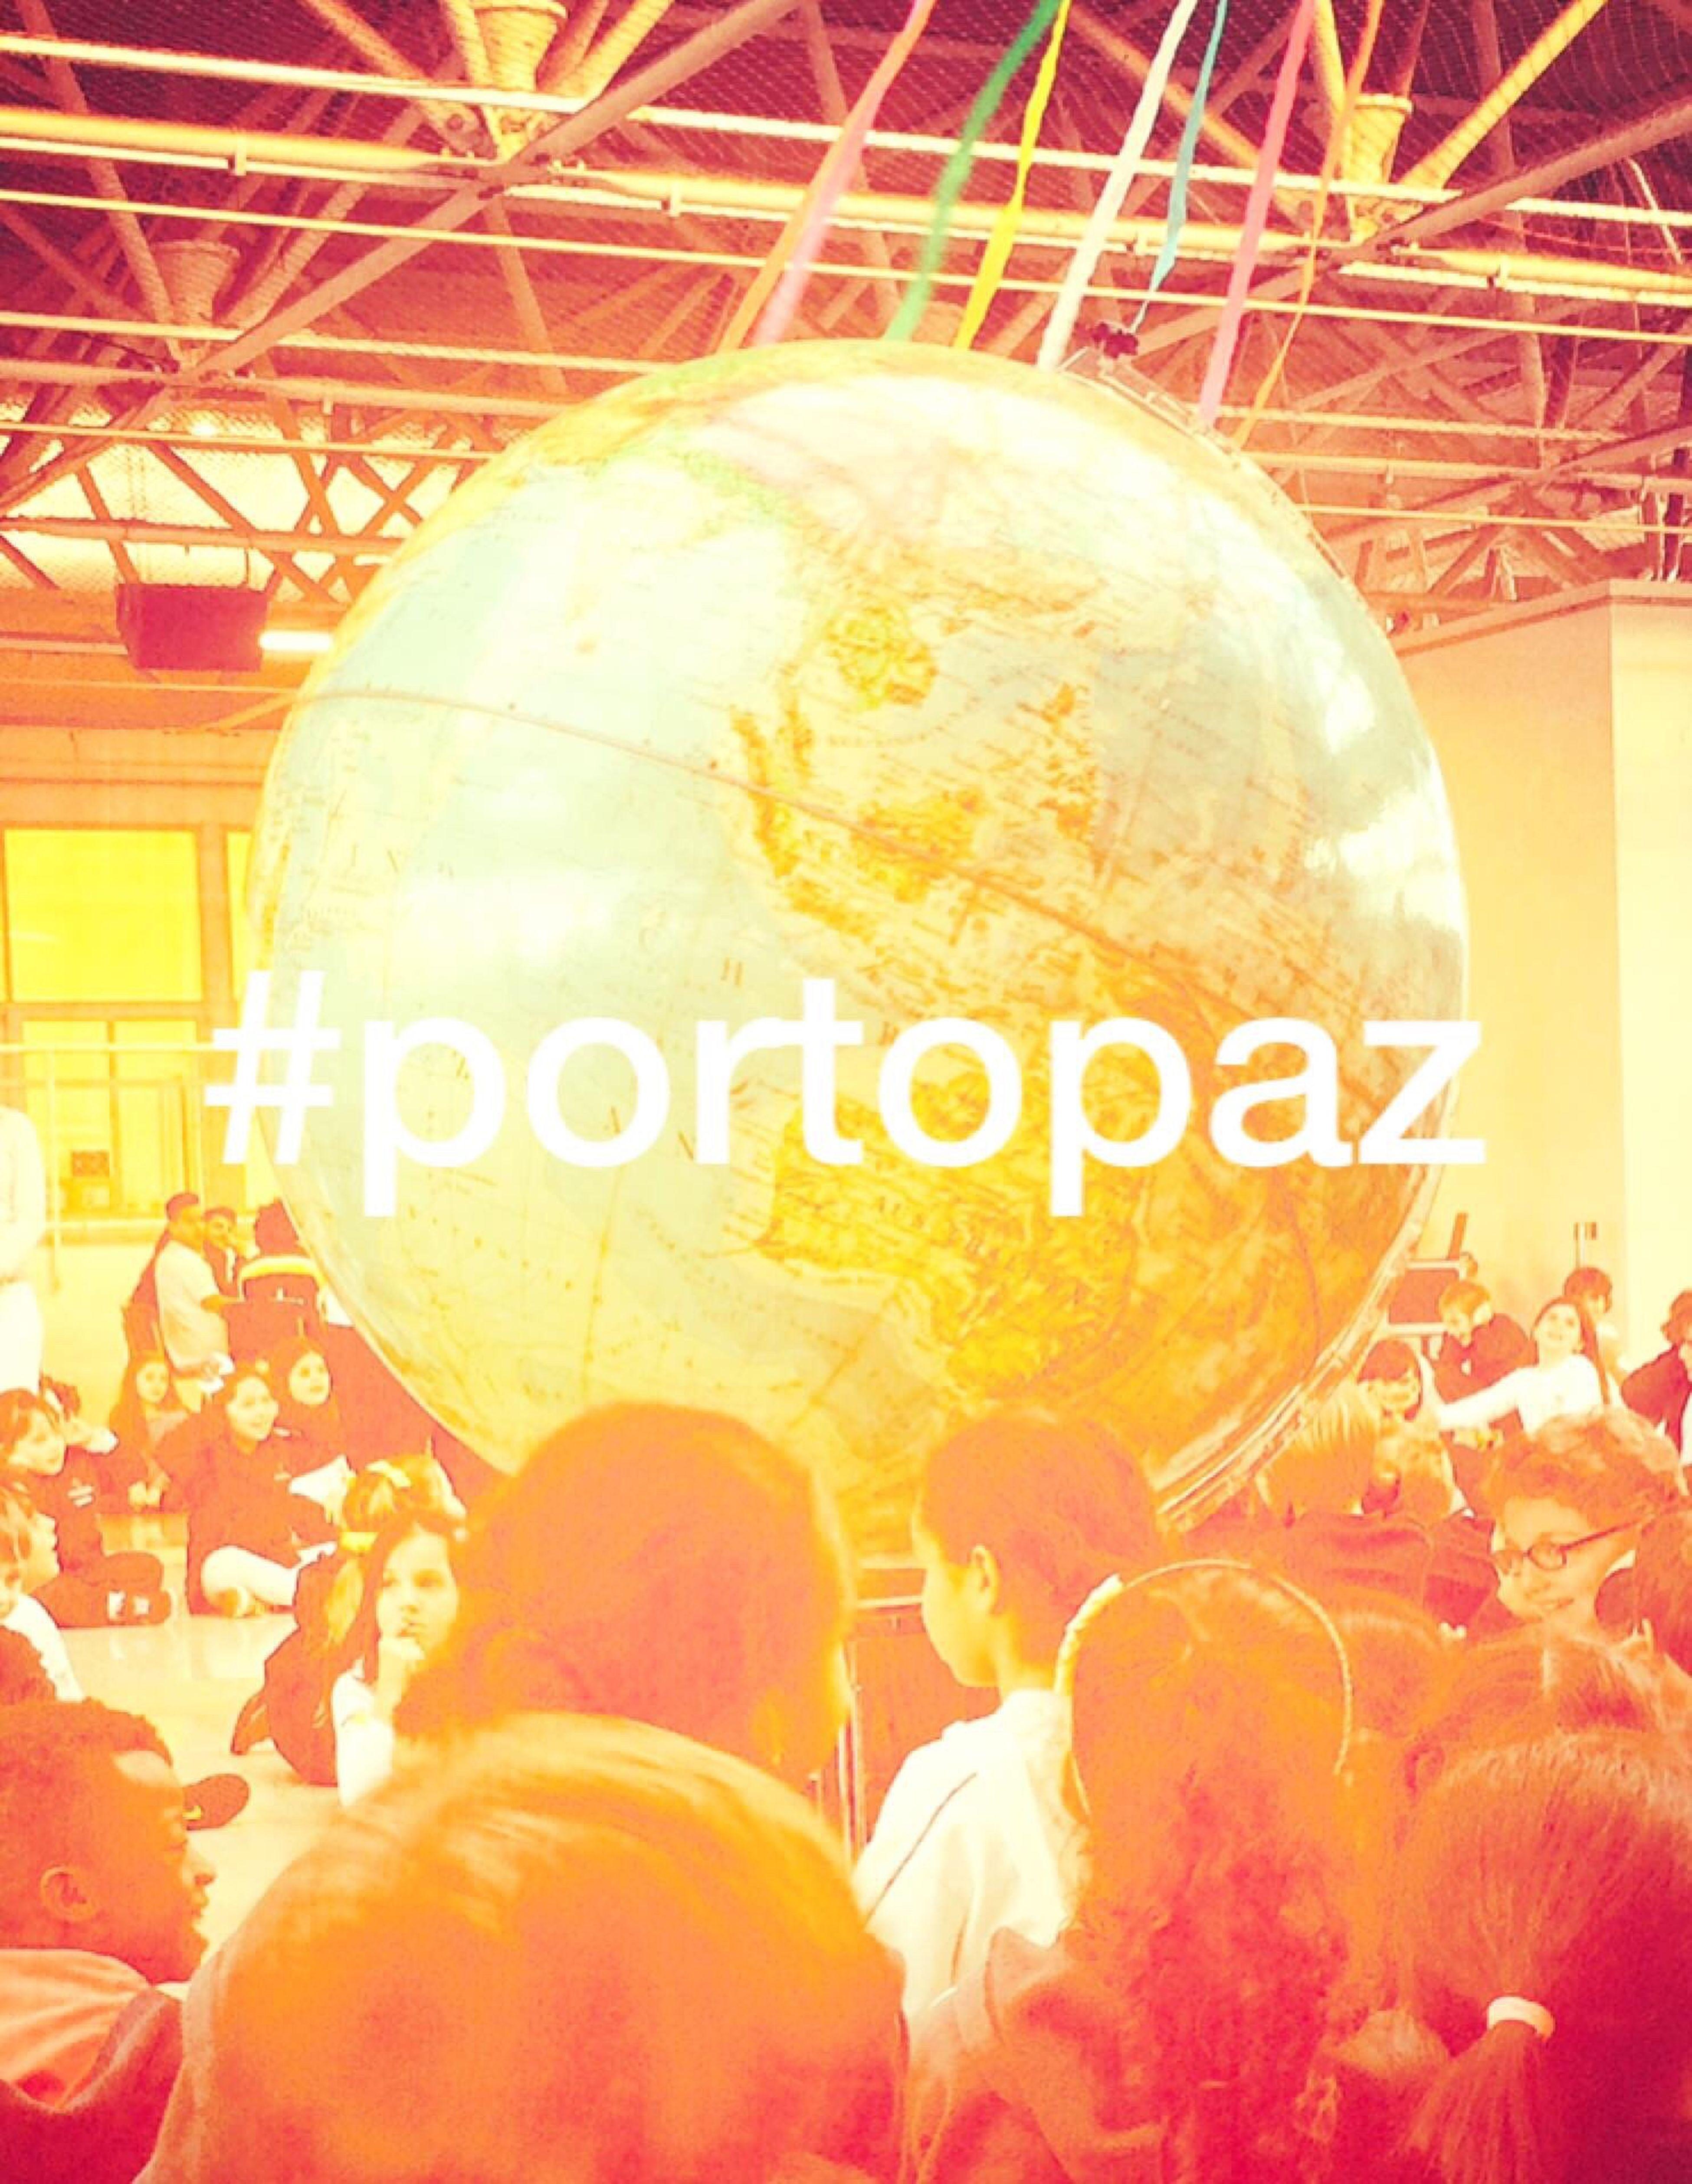 Portopaz Peaceday2016